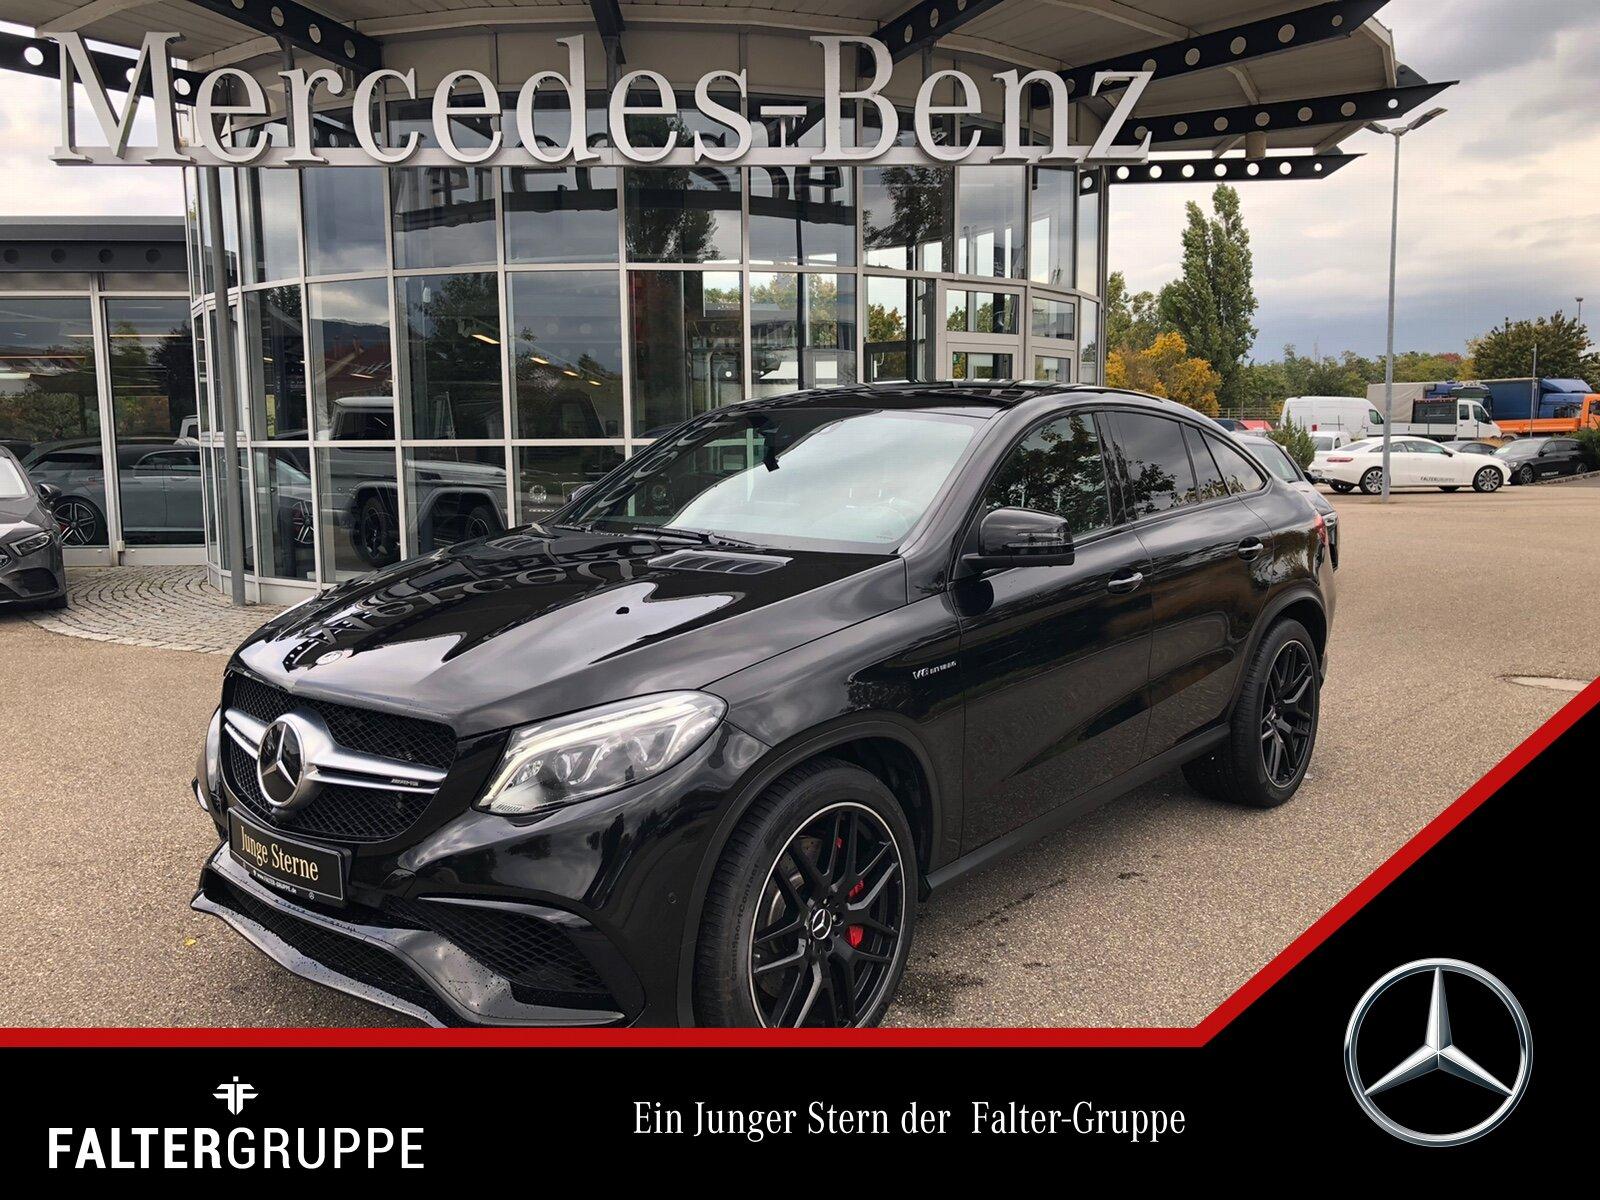 Mercedes-Benz GLE 63 S Night DISTRO Pano AIRMATIC Standhzg AHK, Jahr 2018, Benzin